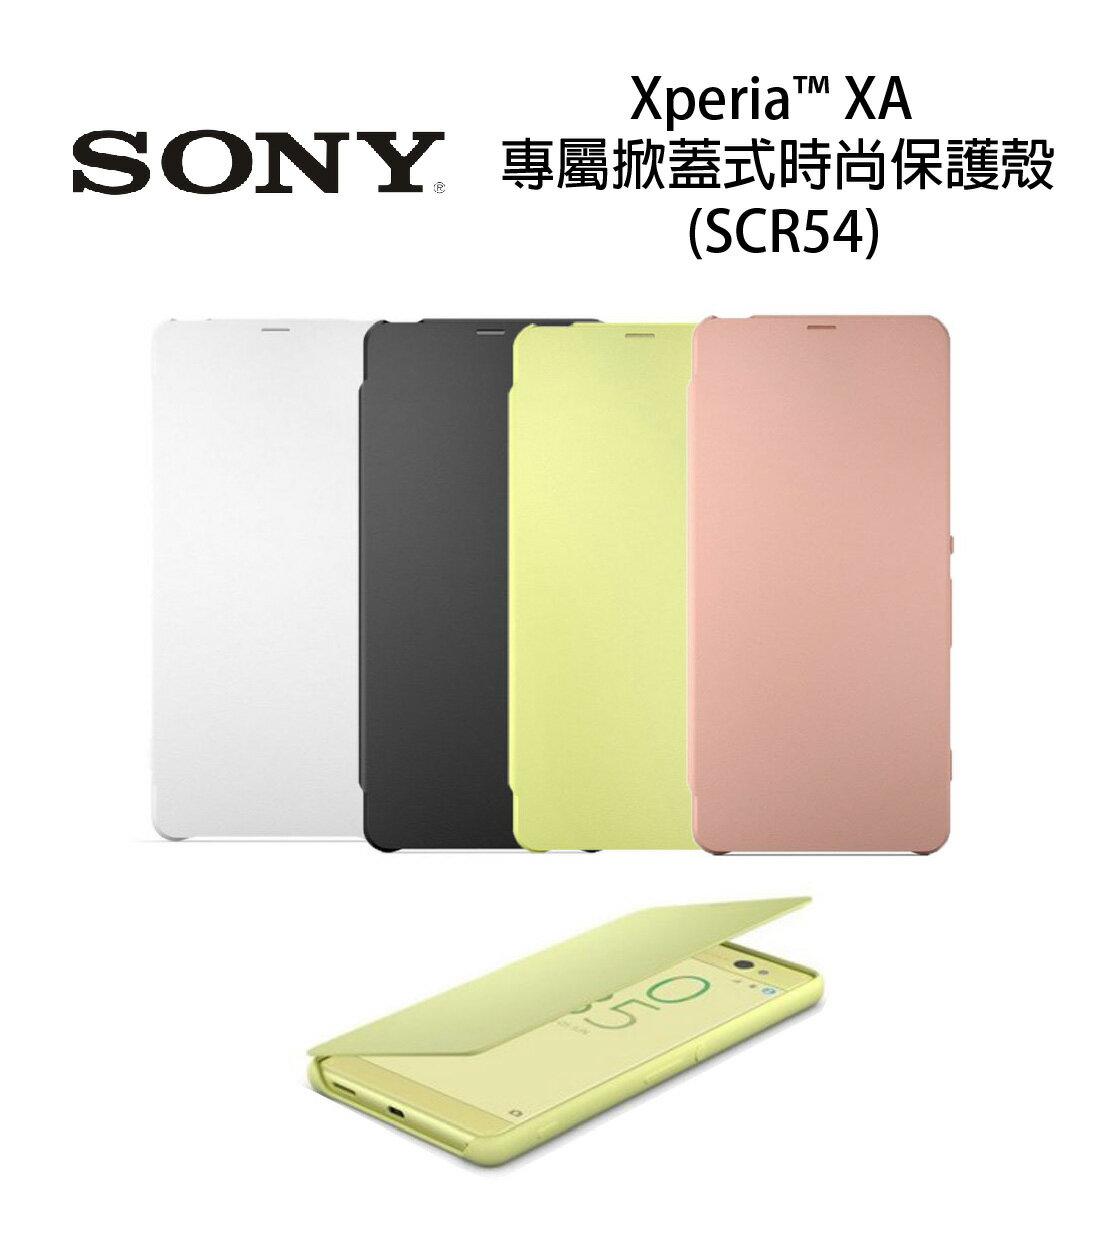 SONY Xperia XA 專用原廠側翻皮套 SCR54 《石墨灰/萊姆金/白/玫瑰金》